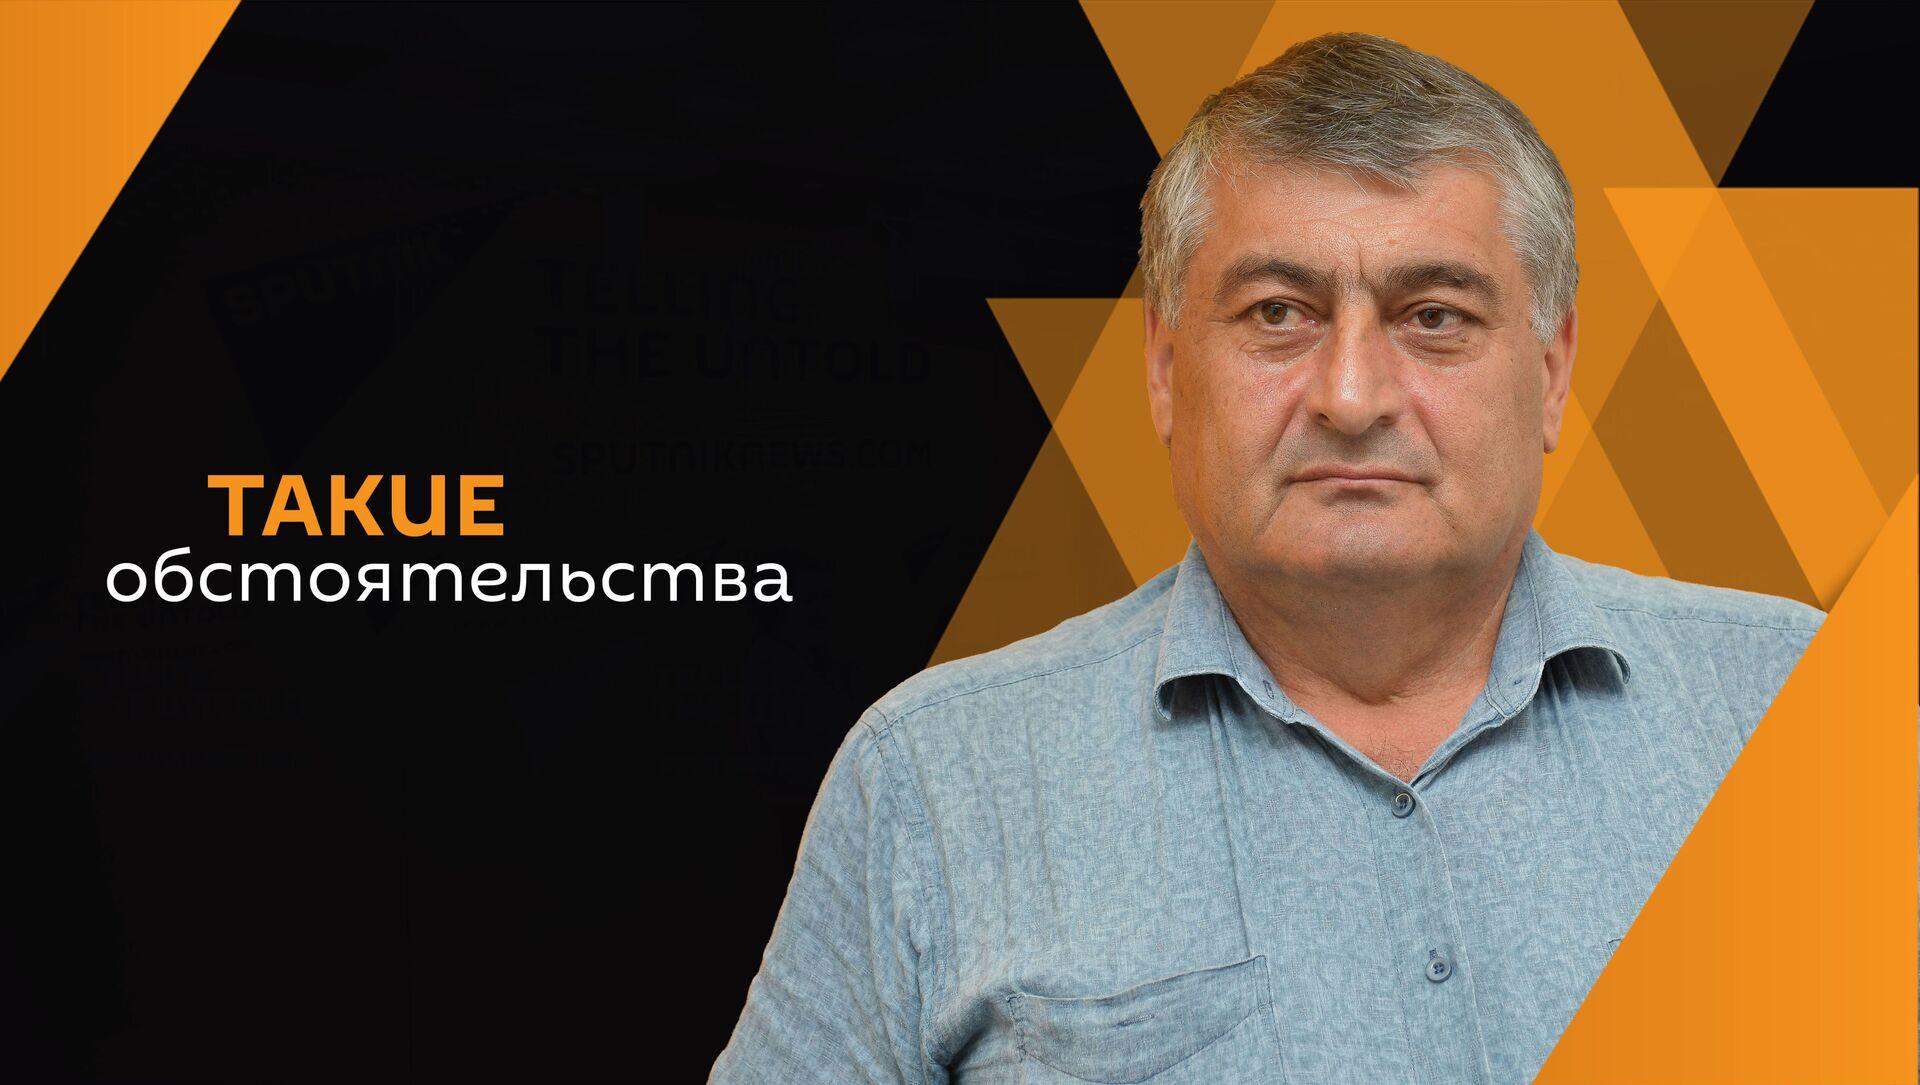 Рафик Григорян - Sputnik Абхазия, 1920, 16.08.2021